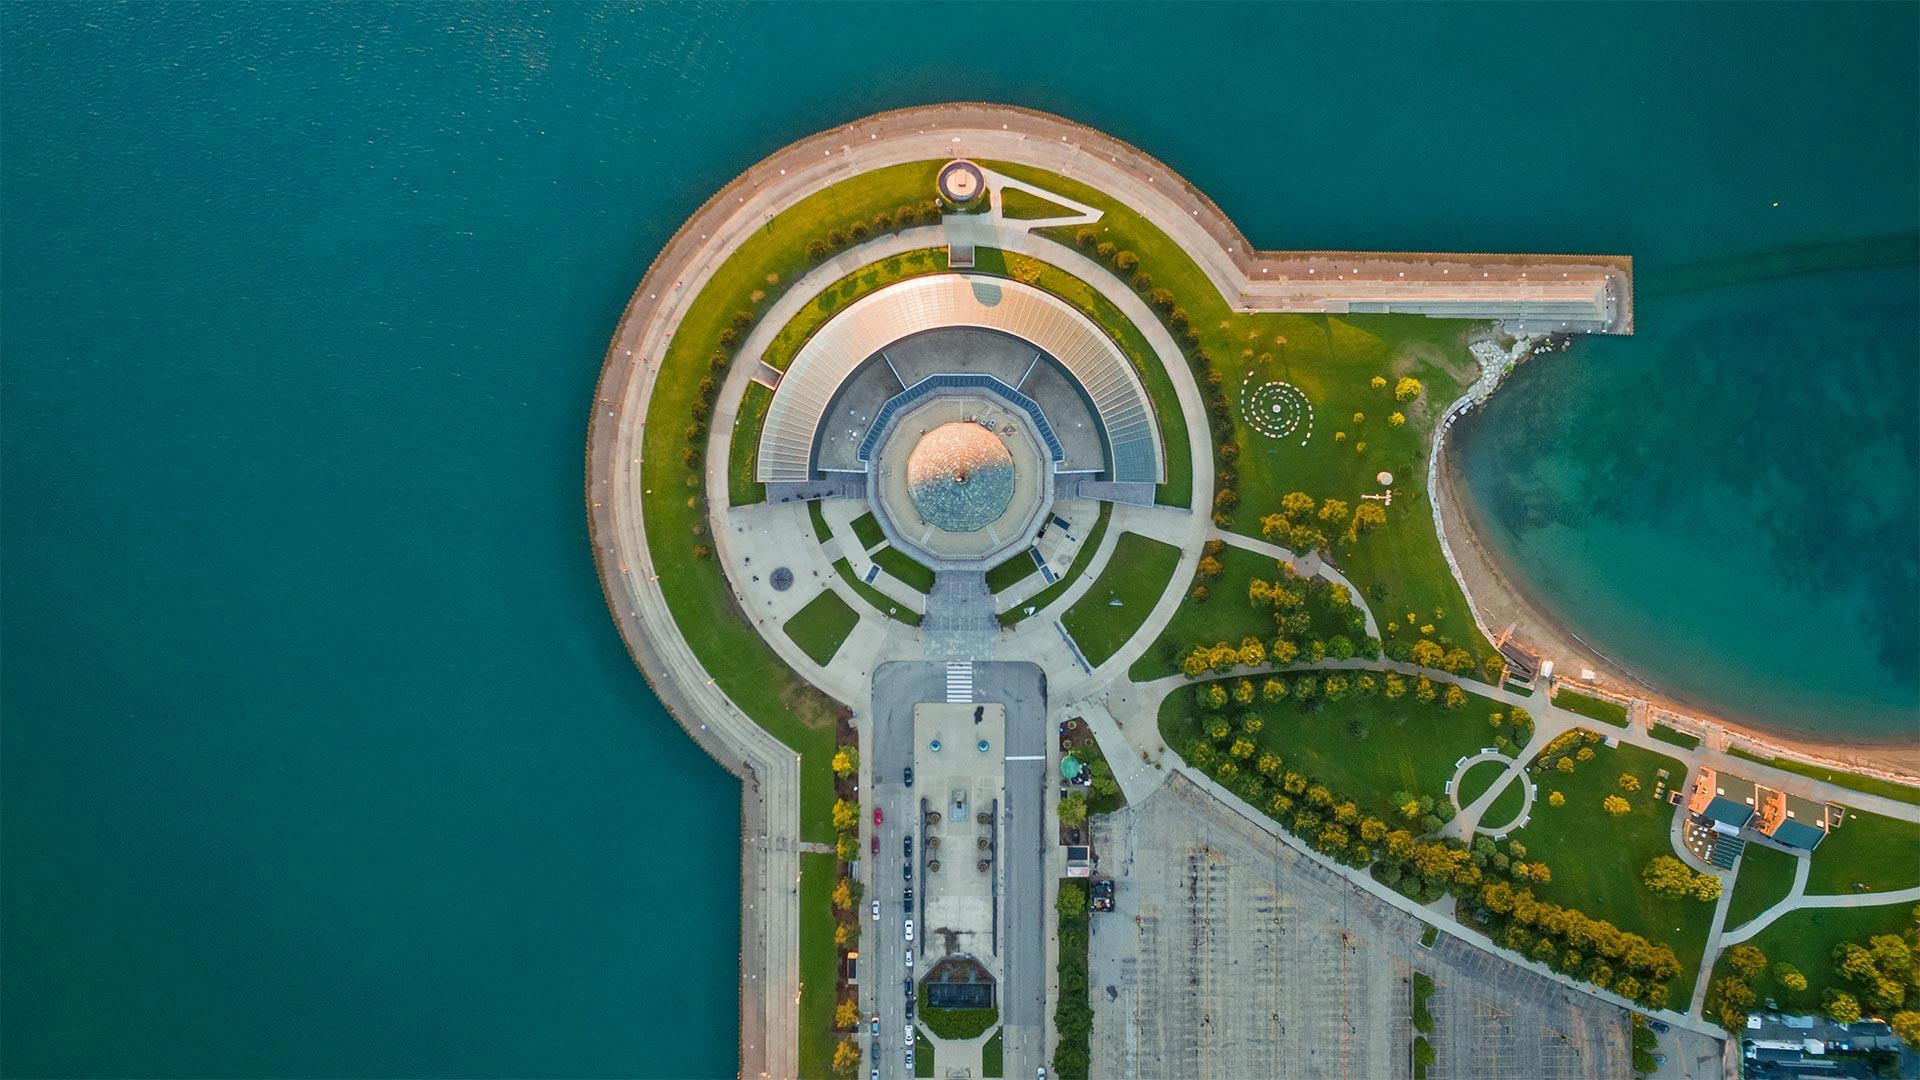 Adler Planetarium near Lake Michigan, Chicago, Illinois (© Amazing Aerial Agency/Offset by Shutterstock)(Bing United States)